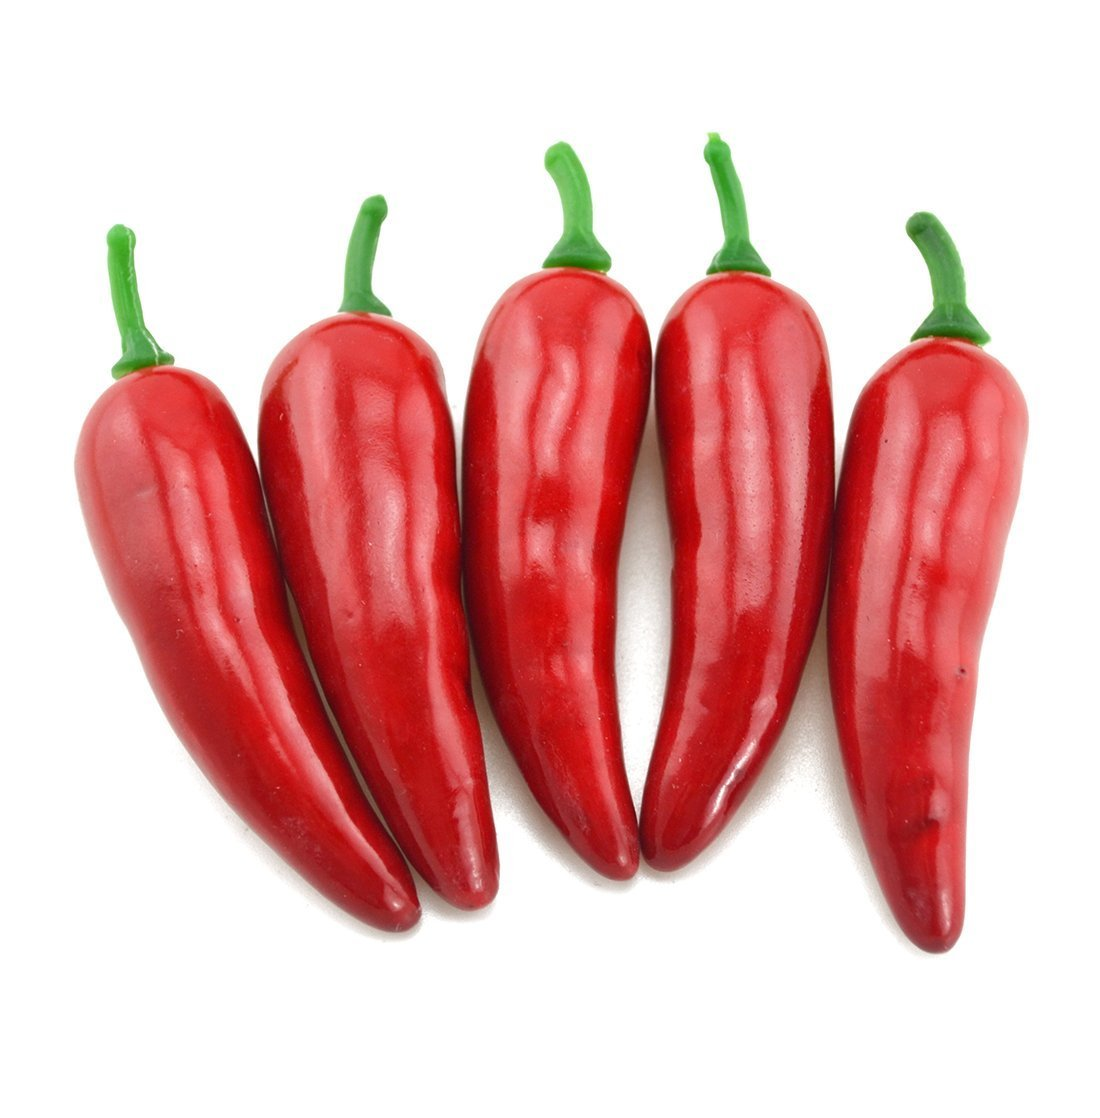 Lorigun 30Pcs Artificial Little Chili Simulation Pepper Mini Three-Colour (Red + Yellow + Green) Small Hot Pepper Lifelike Fake Vegetable Home Decor Each Color 10Pcs